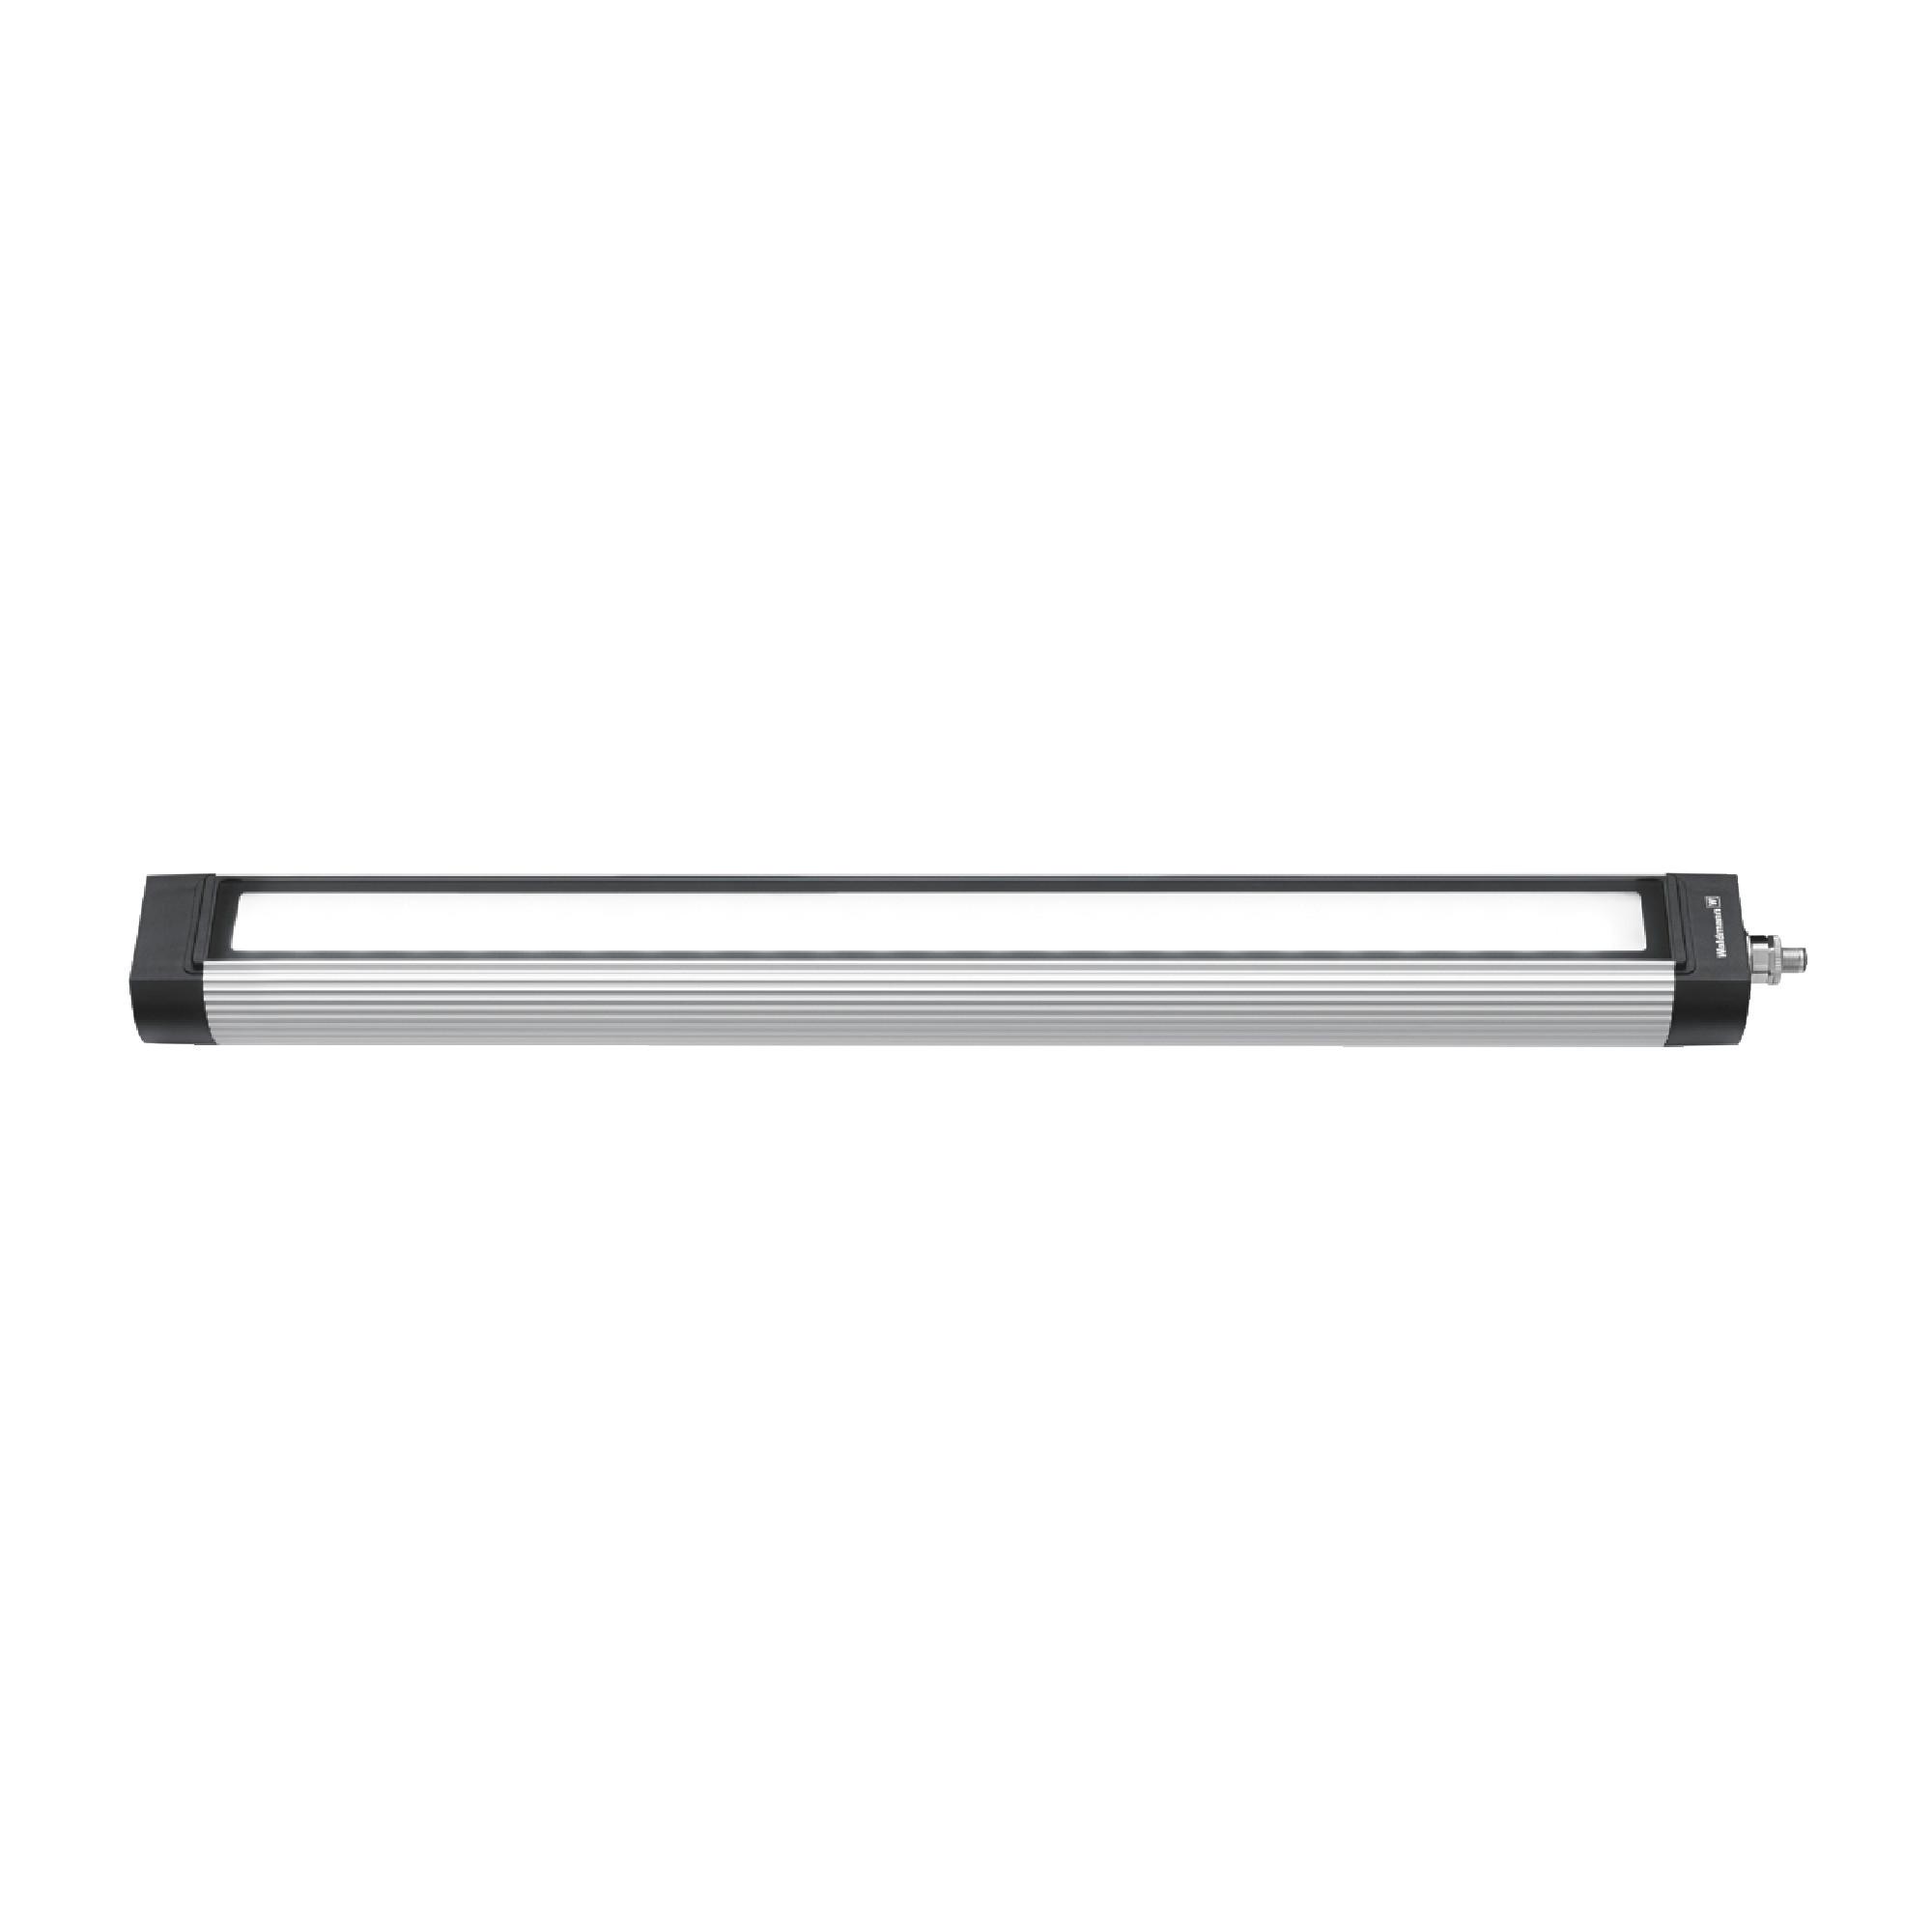 WALDMANN LIGHTING MACH LED PLUS 36 LED Machine Luminaire